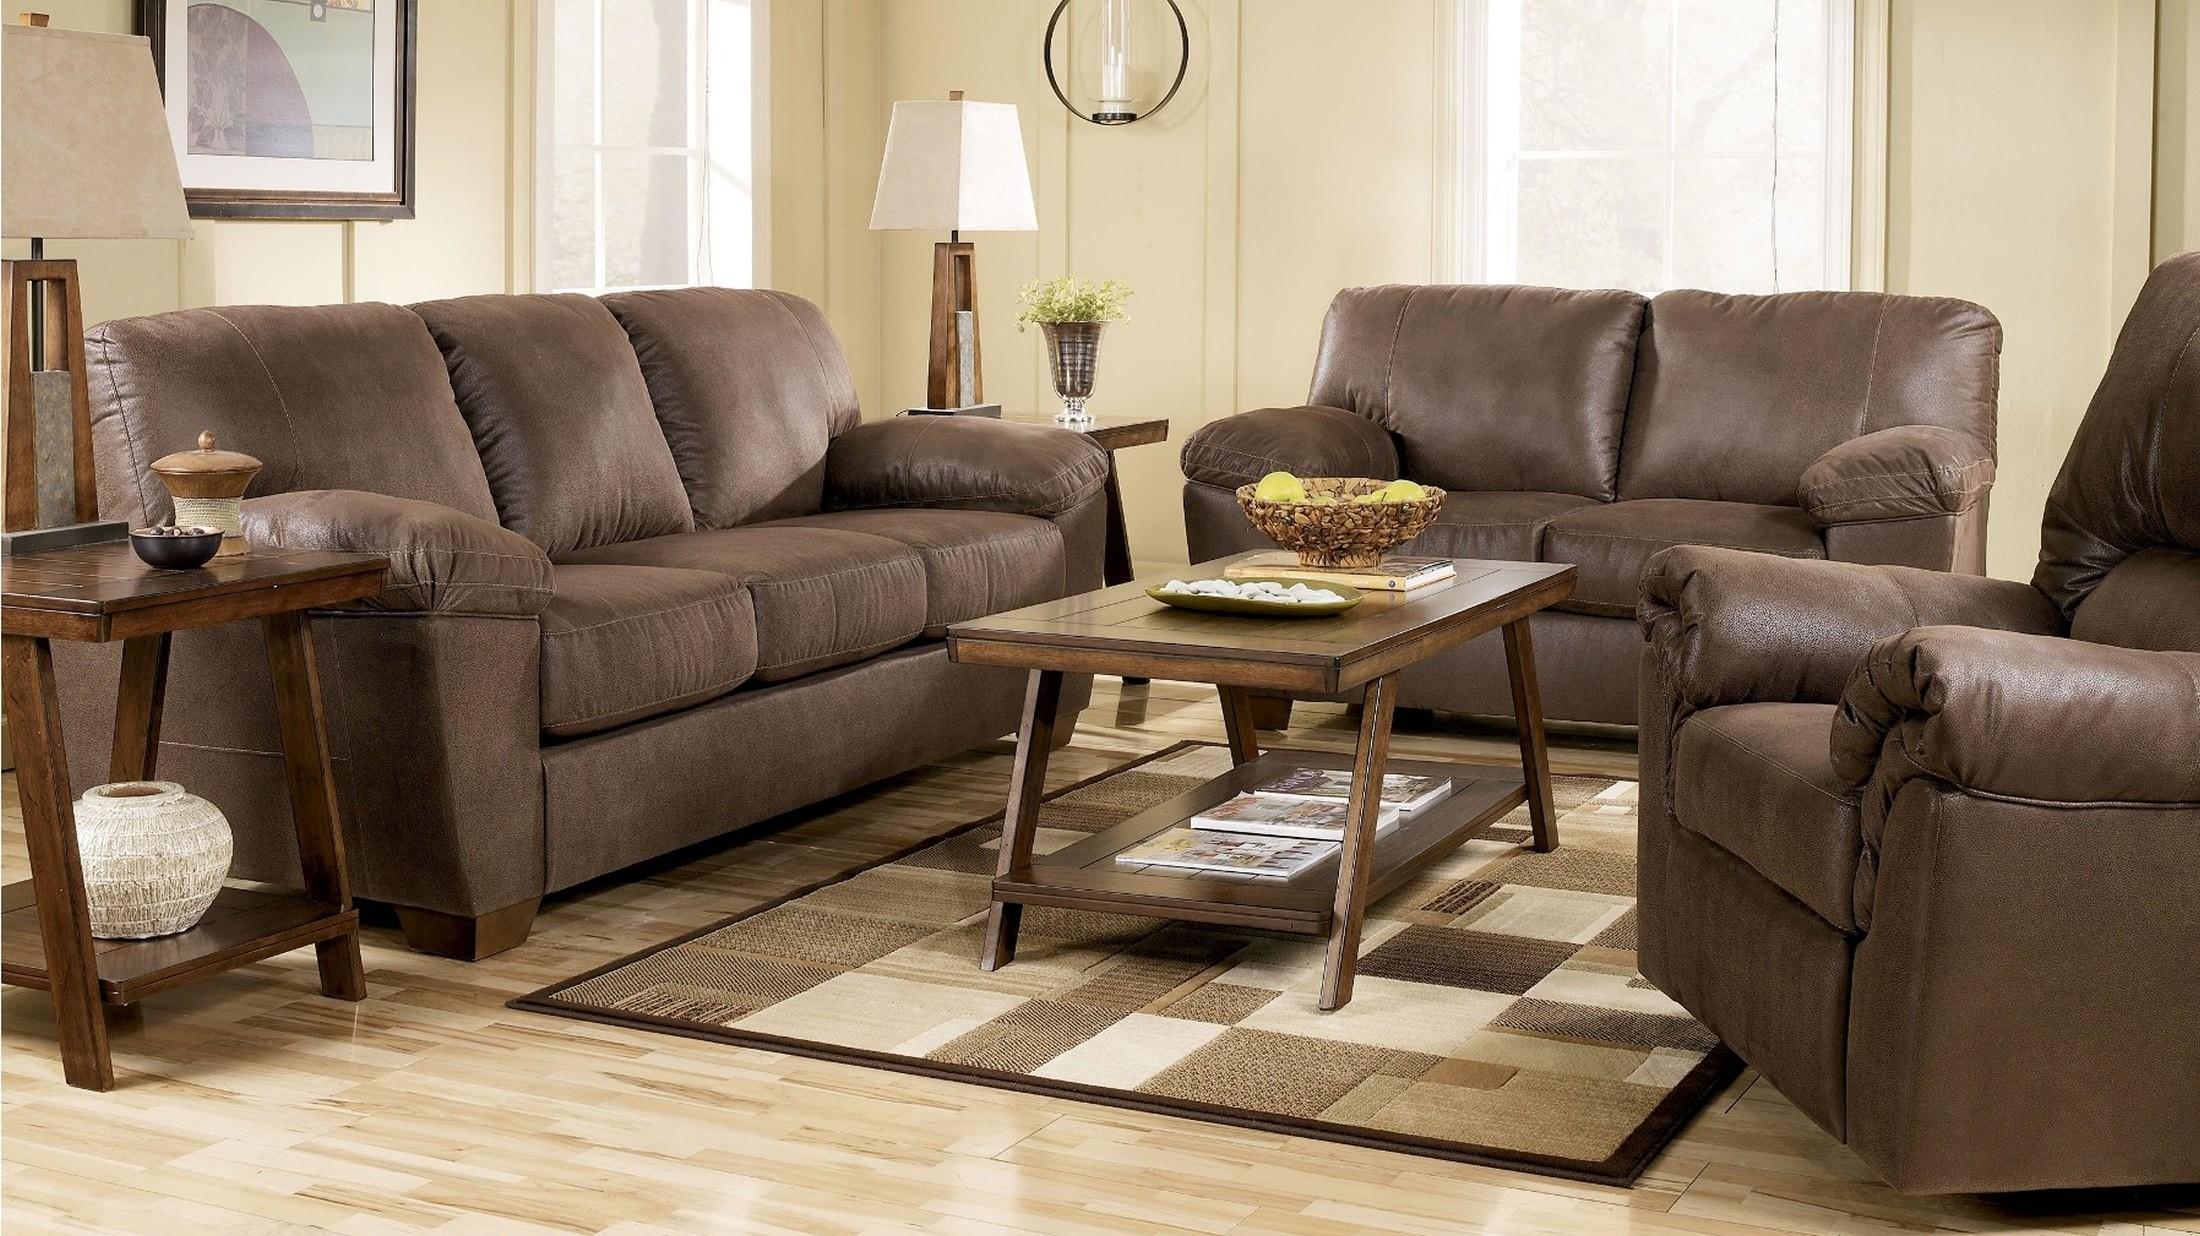 Amazon walnut living room set from ashley 67505 for Walnut furniture living room